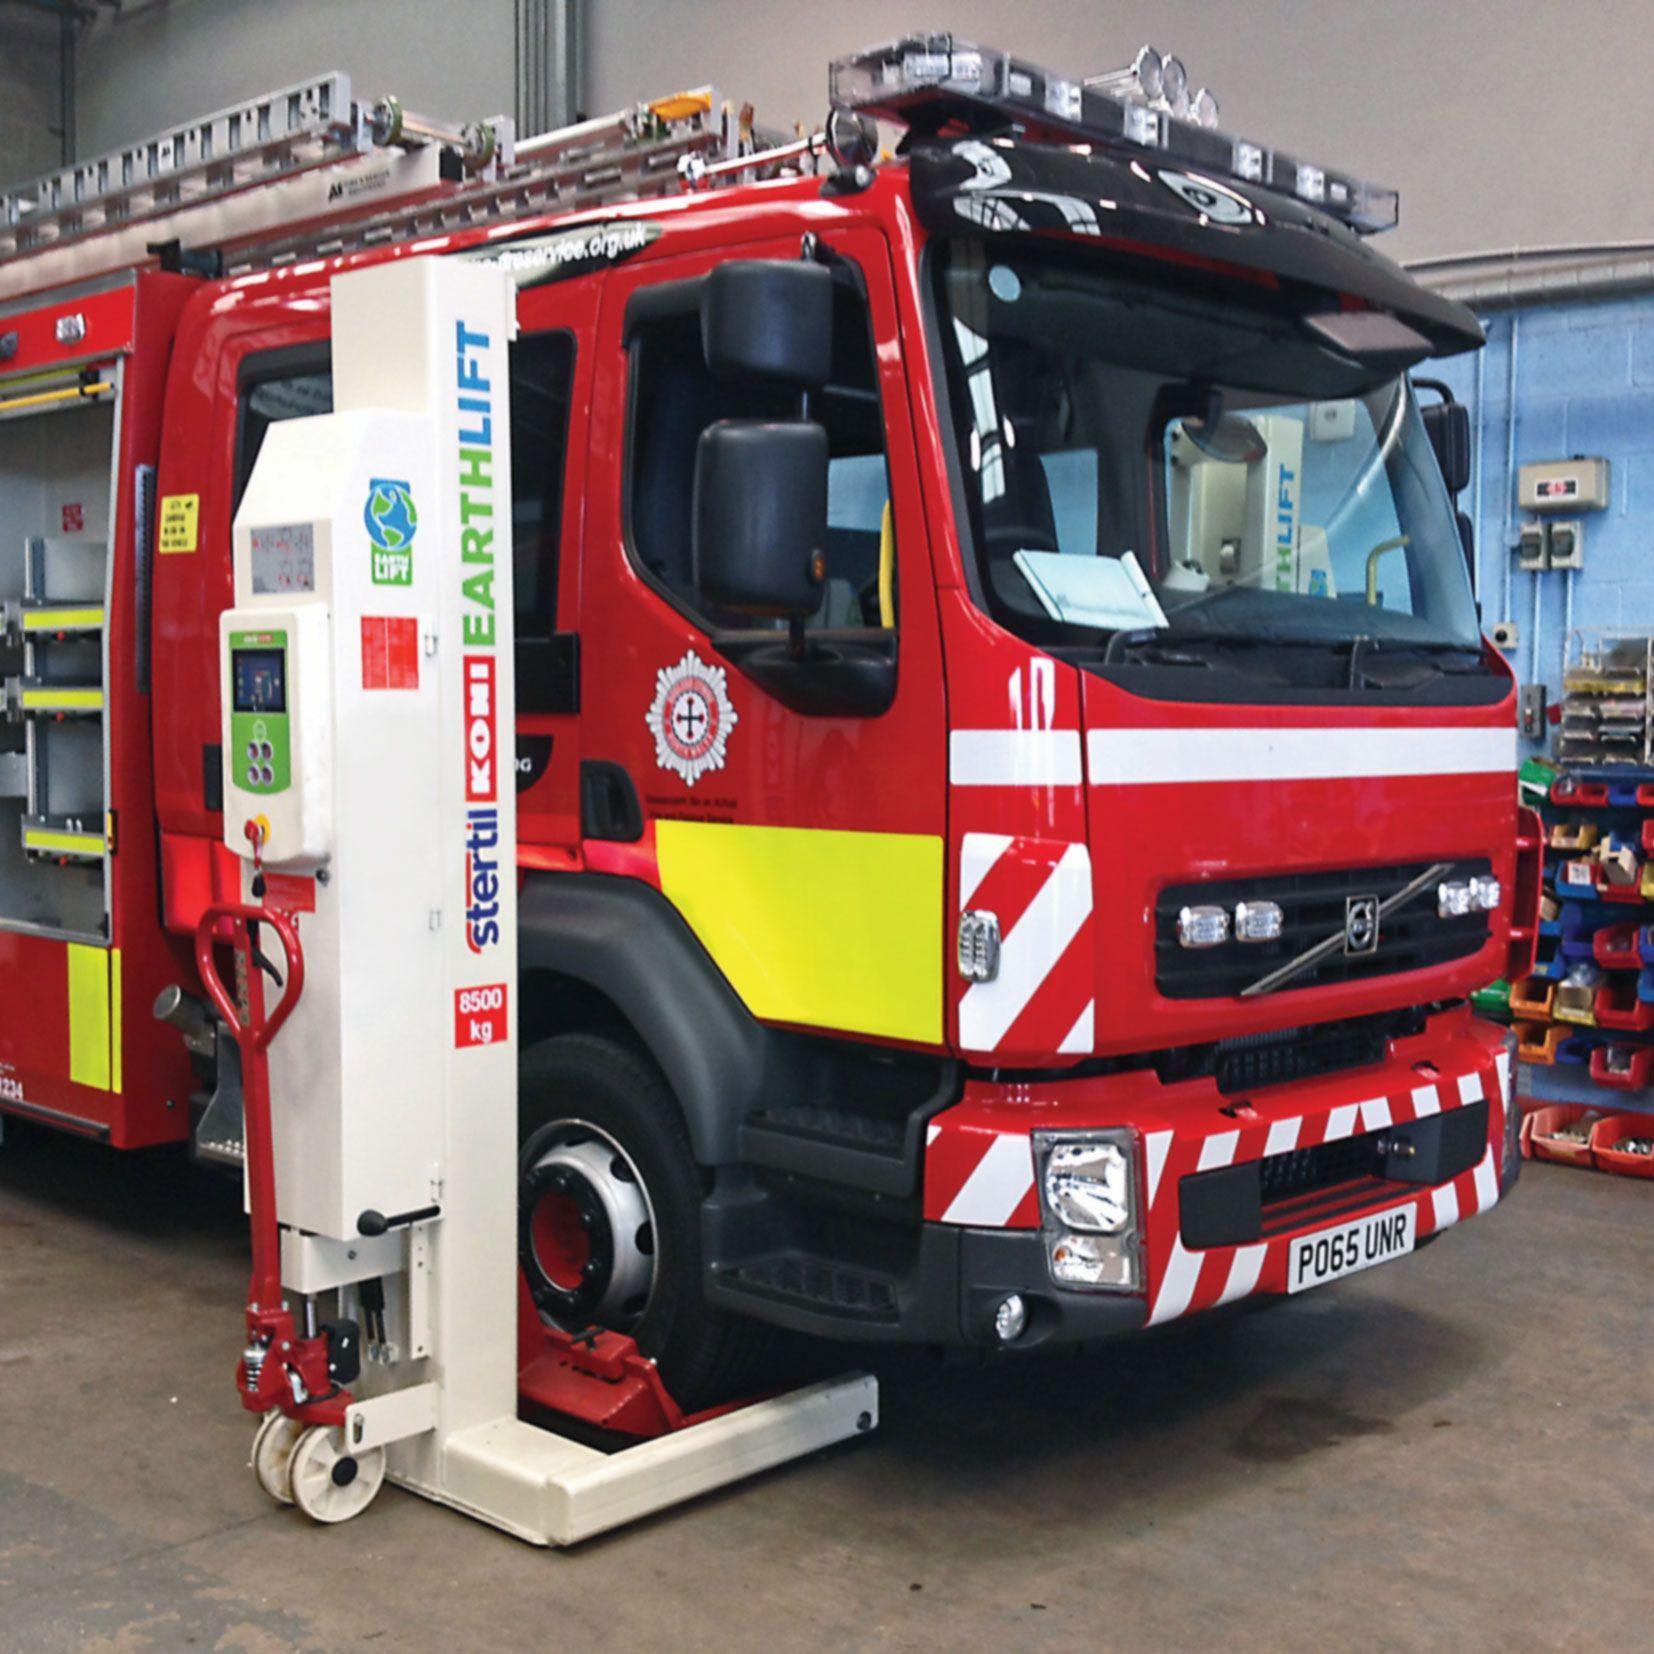 Feuerwehr Nord Wales Baut Auf Earthlift Stertil Koni